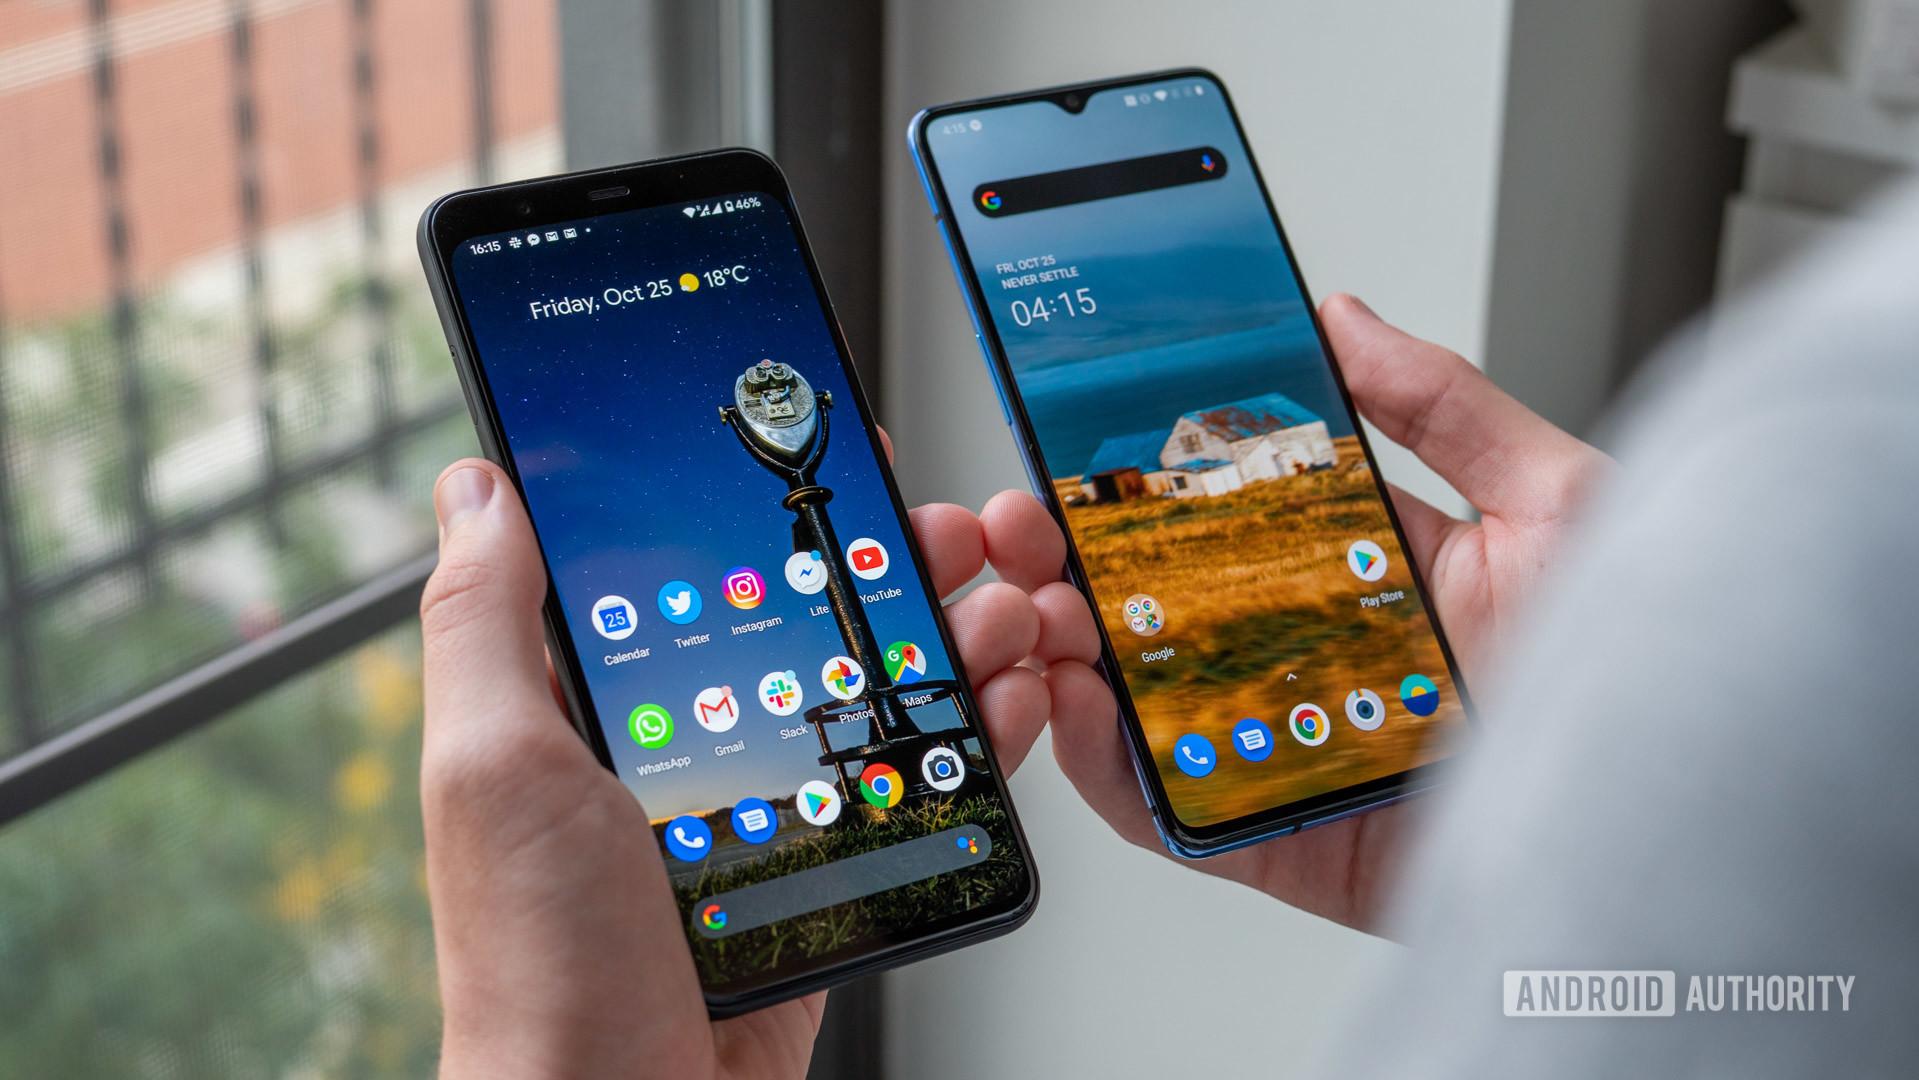 Google Pixel 4 XL vs OnePlus 7T home screen in hand